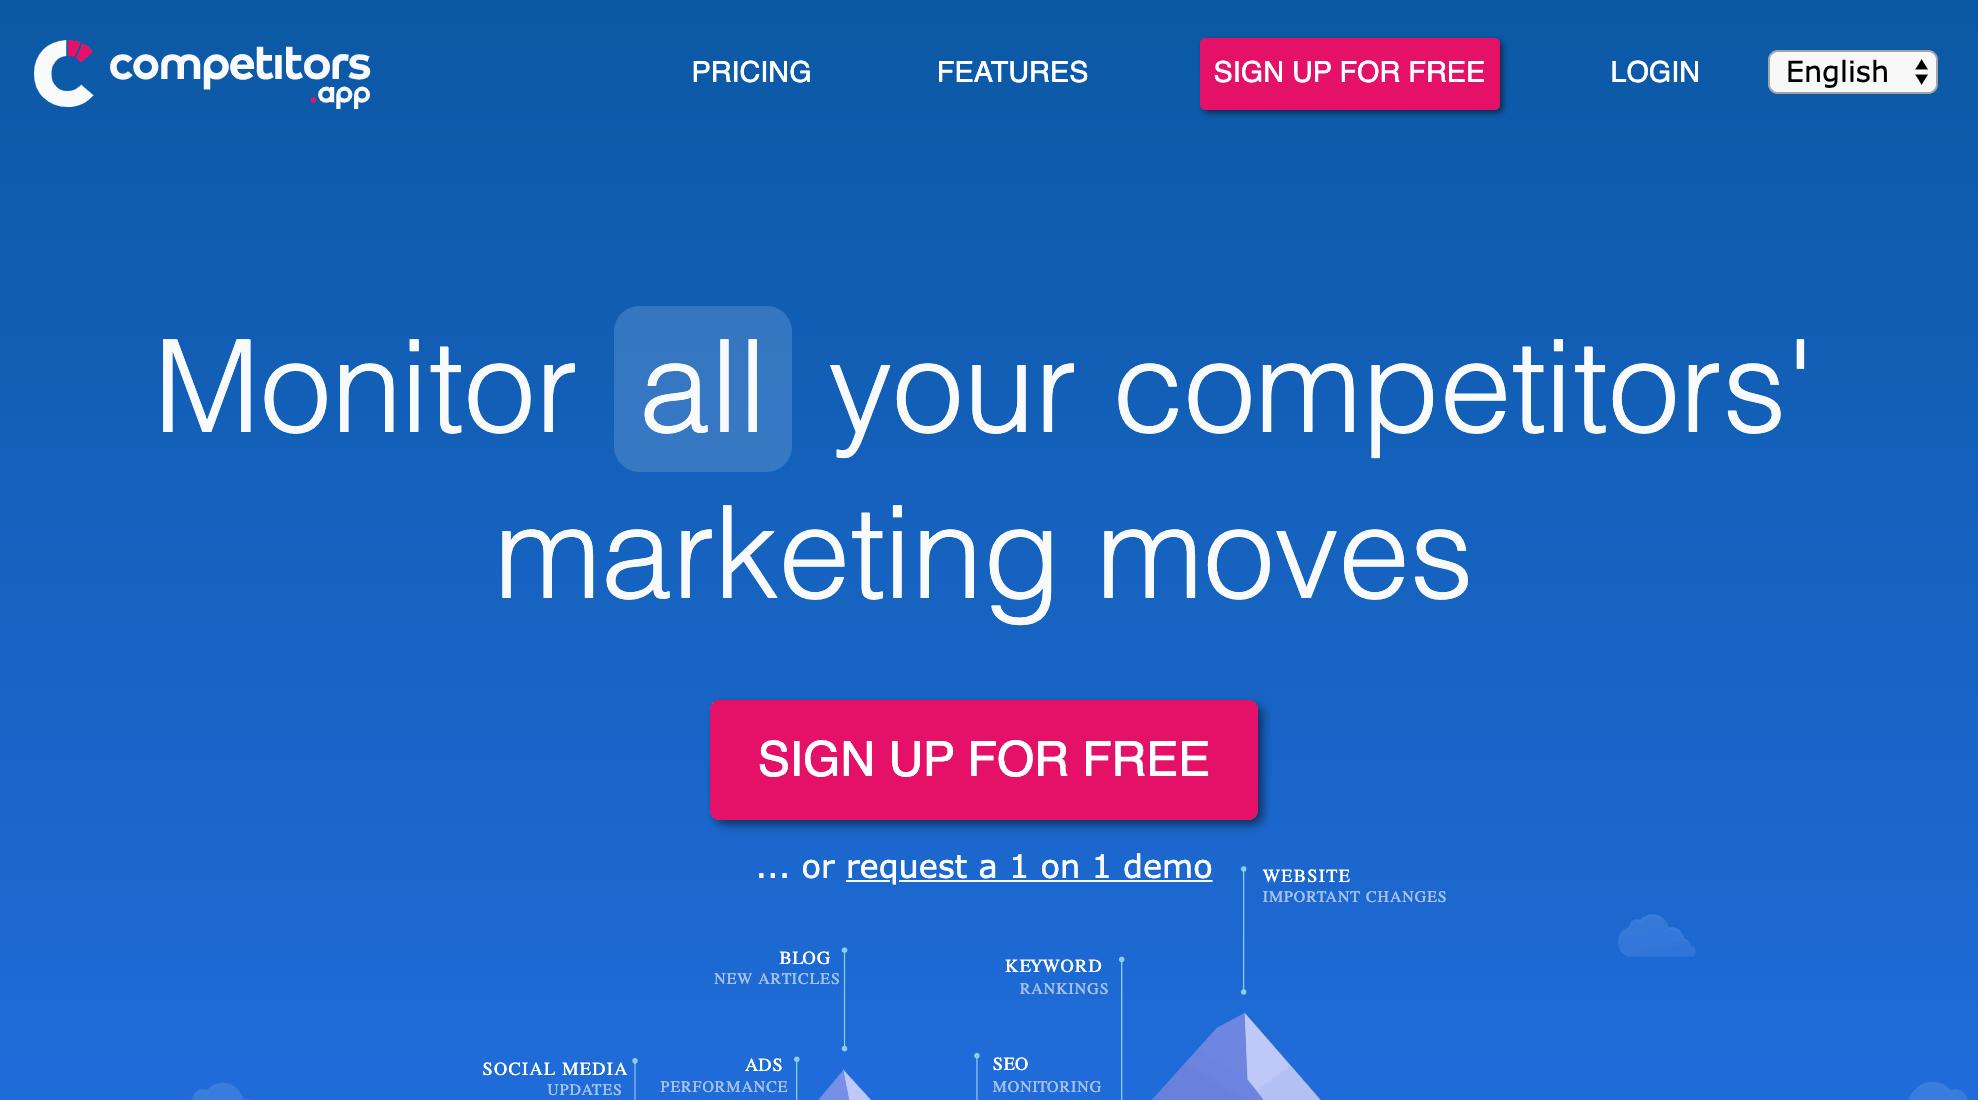 Competitors.app – 40% Discount